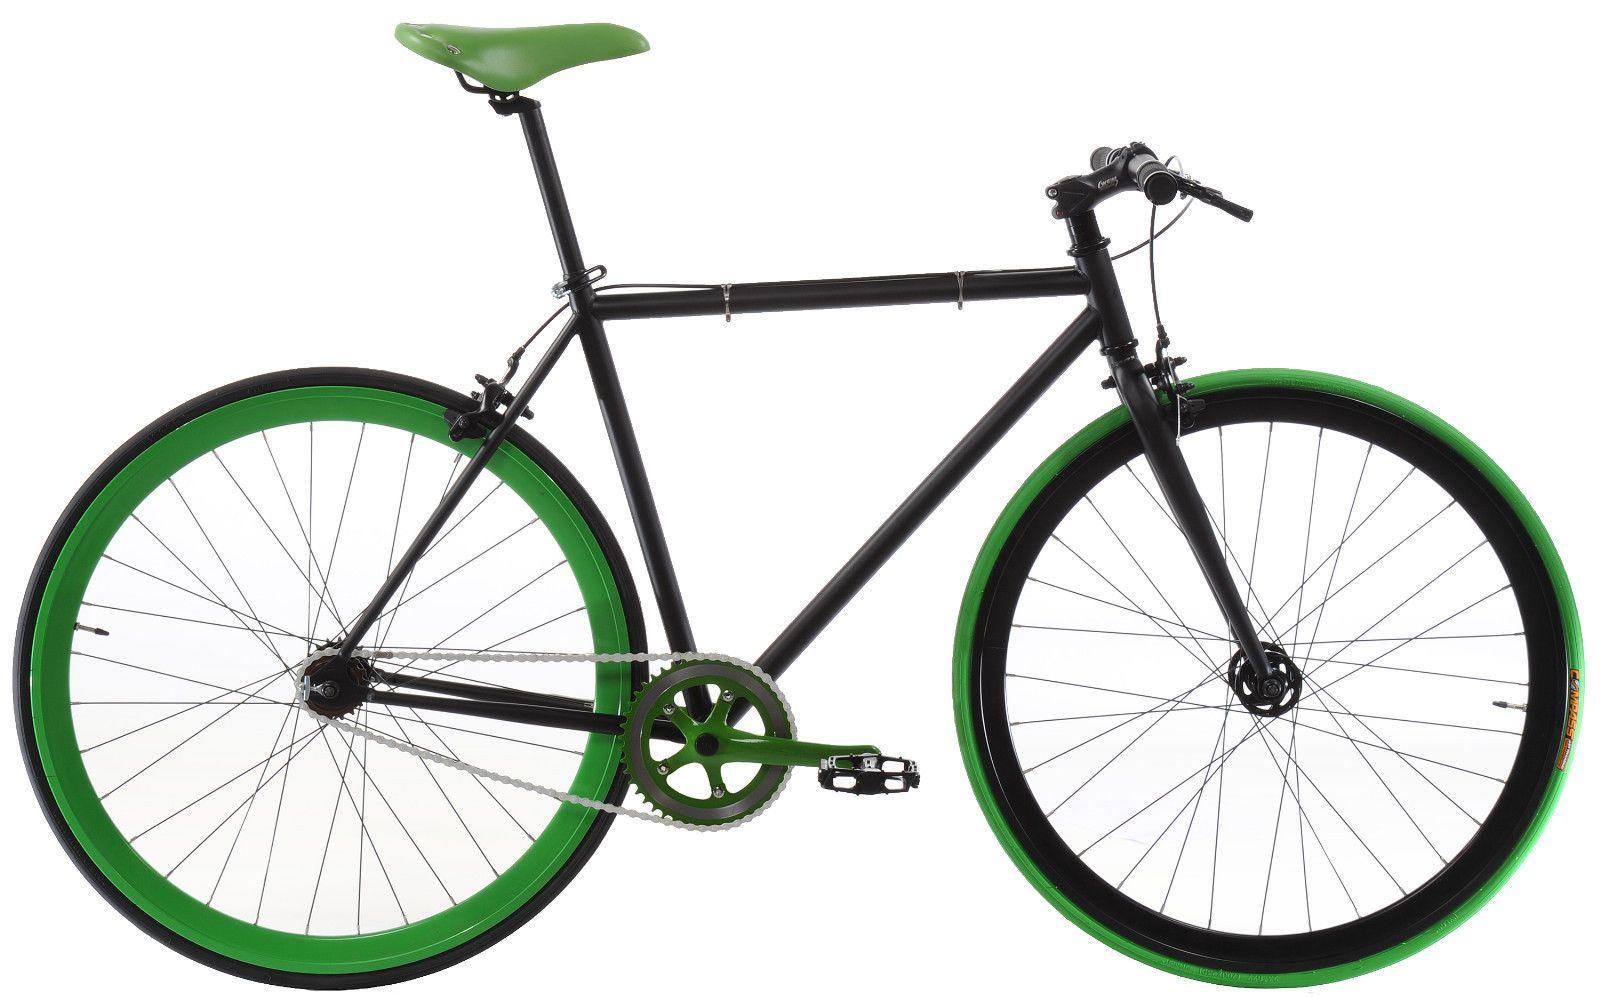 Niner SIR 9 2-Star SLX/Deore Bike 2014 | Bikes | Niner | www ...